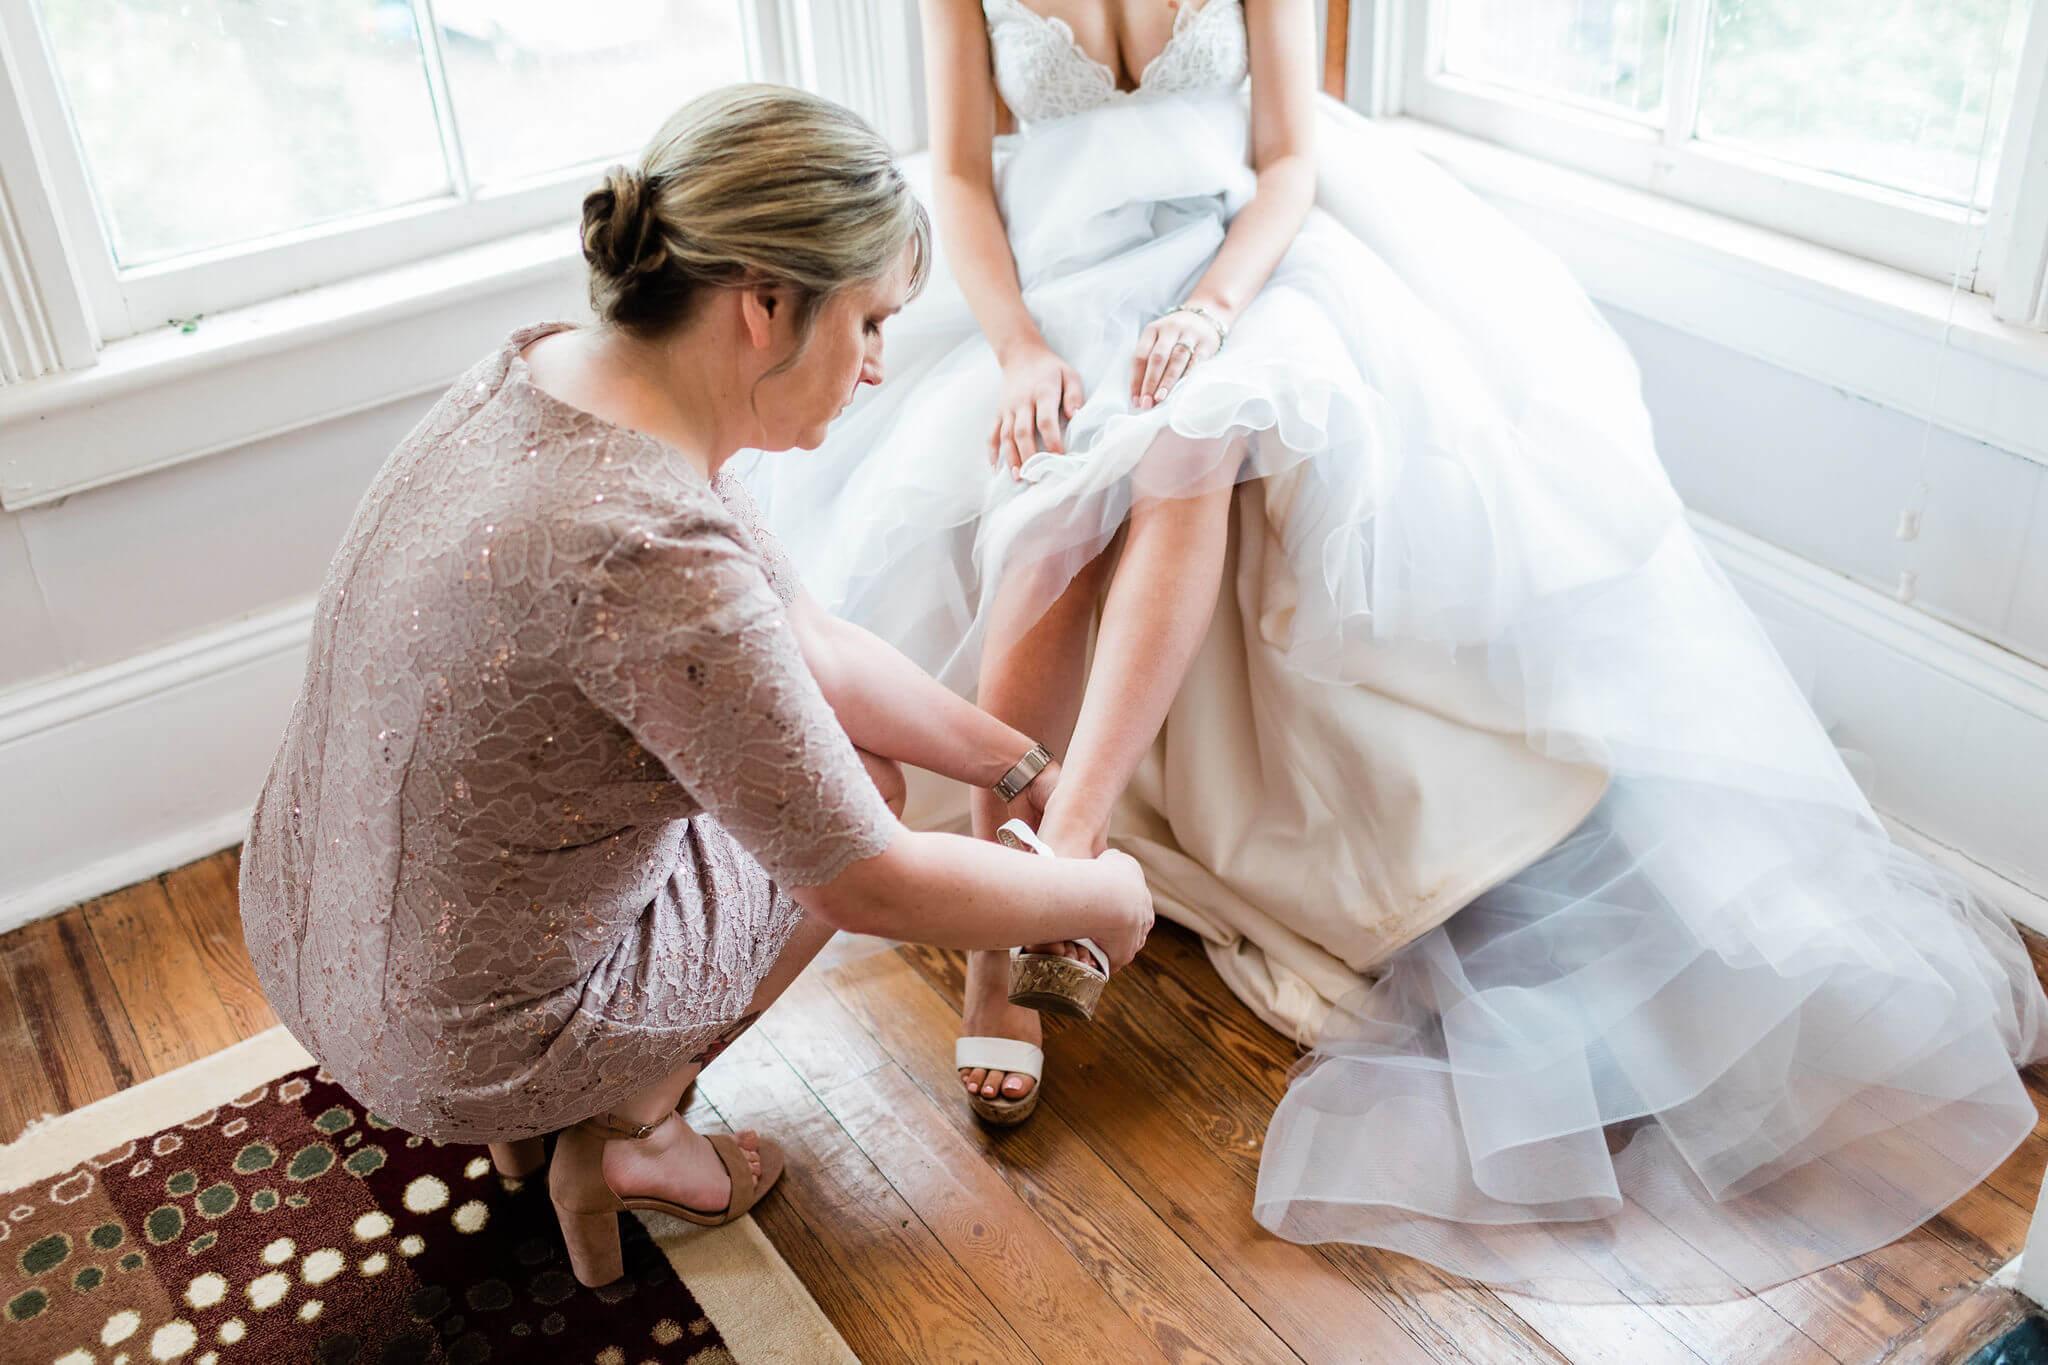 Apt-b-photography-savannah-wedding-photographer-savannah-wedding-hayley-paige-wedding-dress-intimate-wedding-photographer-27.JPG